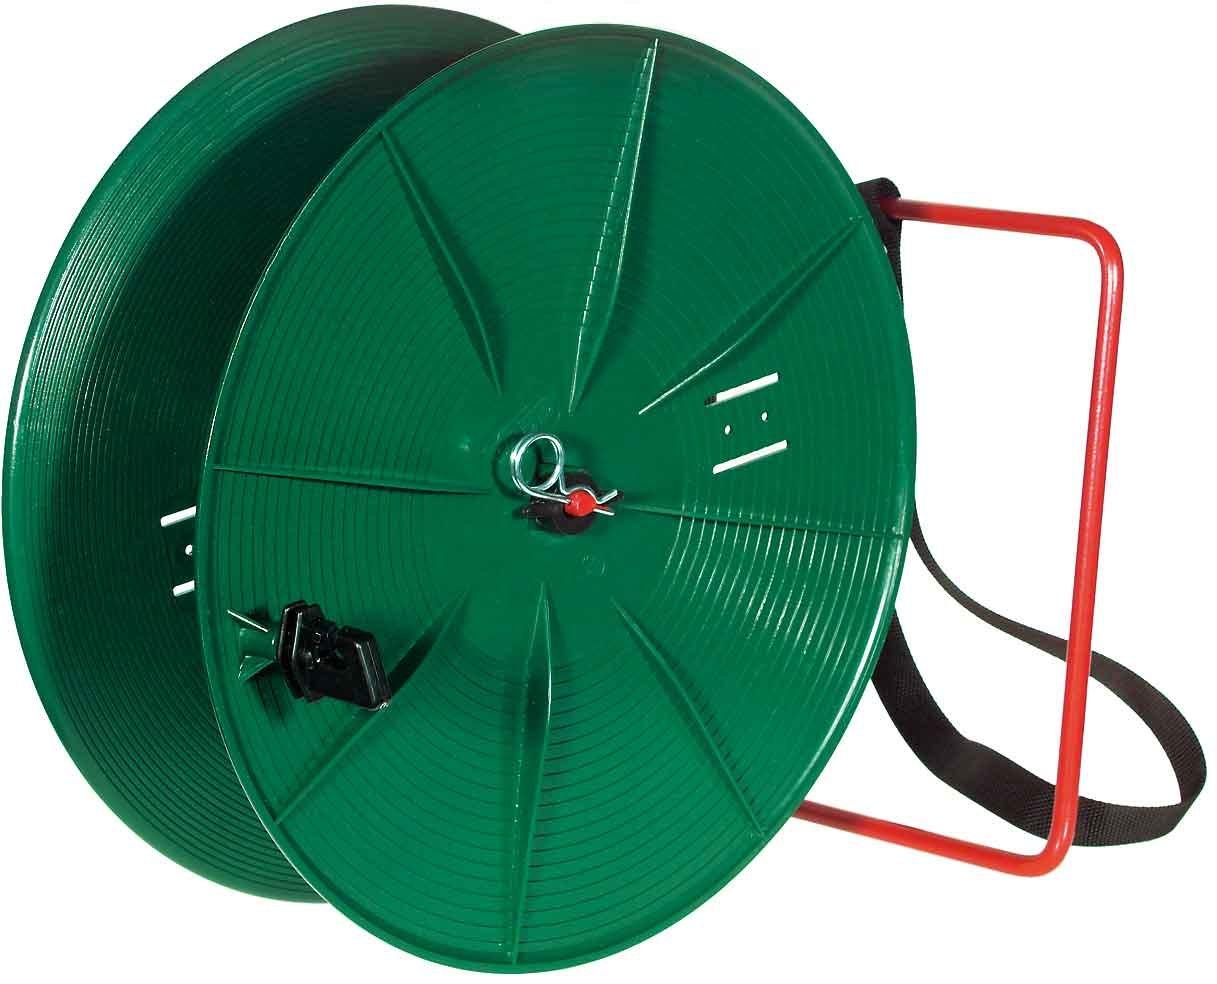 Breitbandhaspel mit Rückenträger Göbel